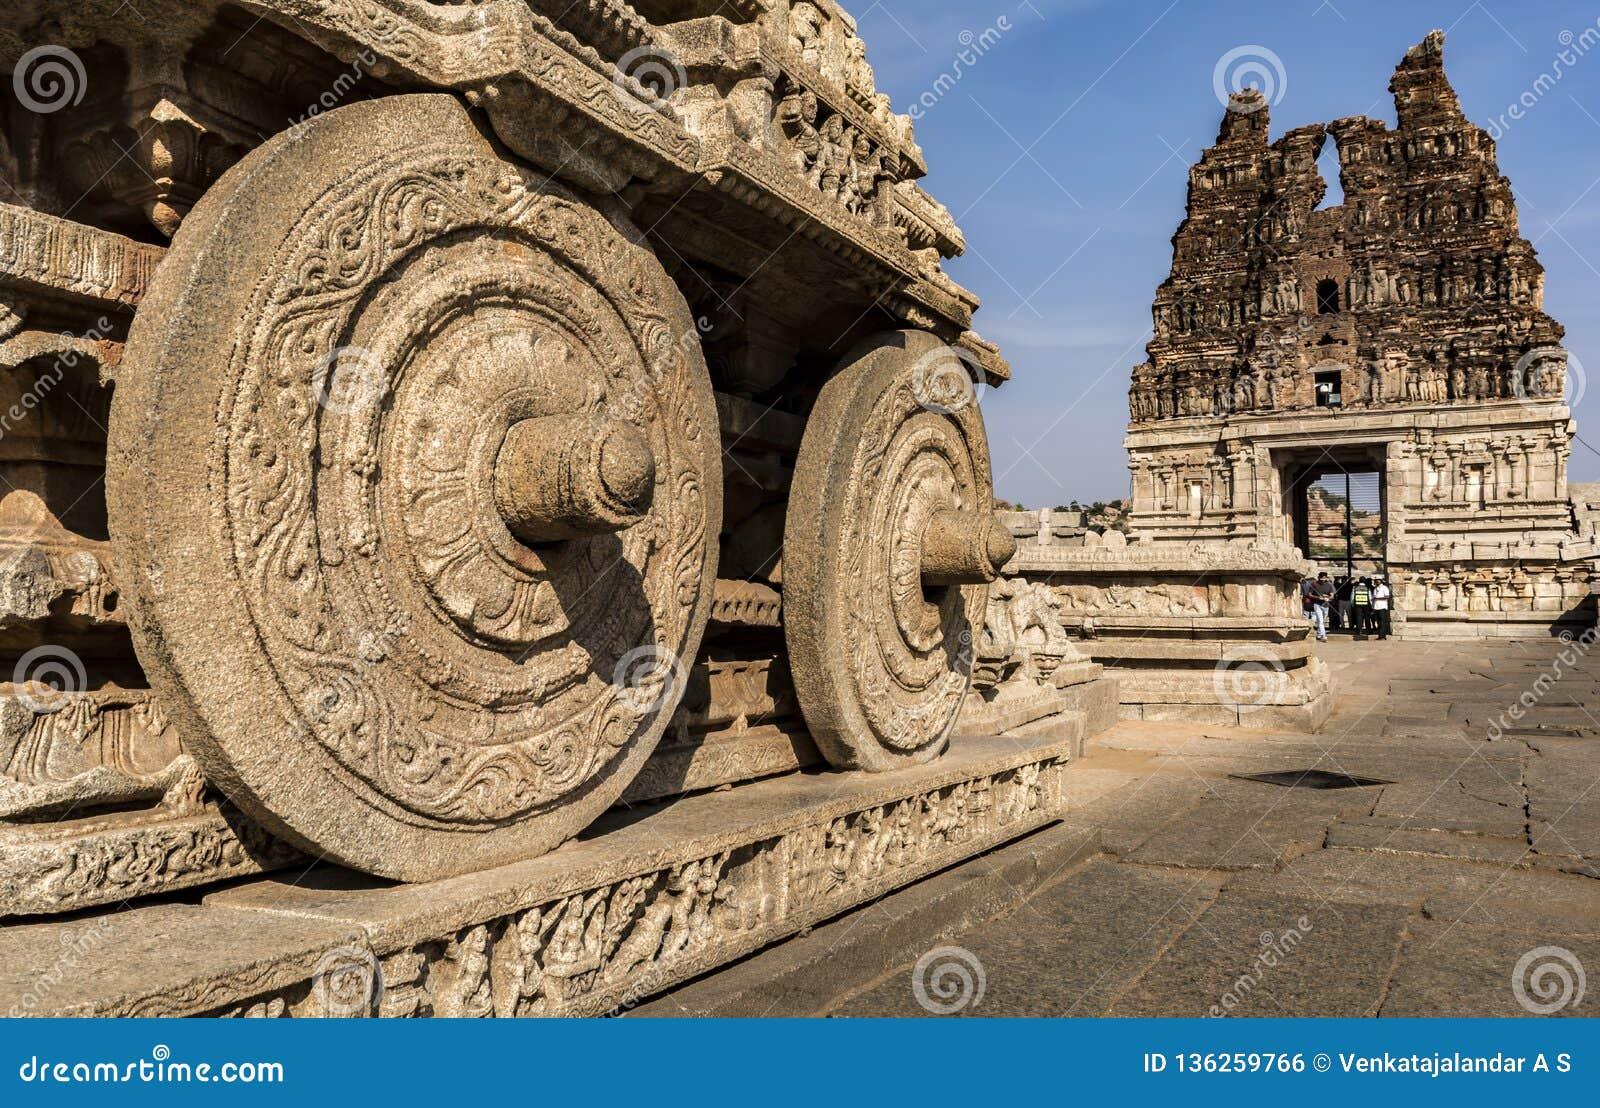 El carro de piedra rueda - el templo Hampi de Vtittala